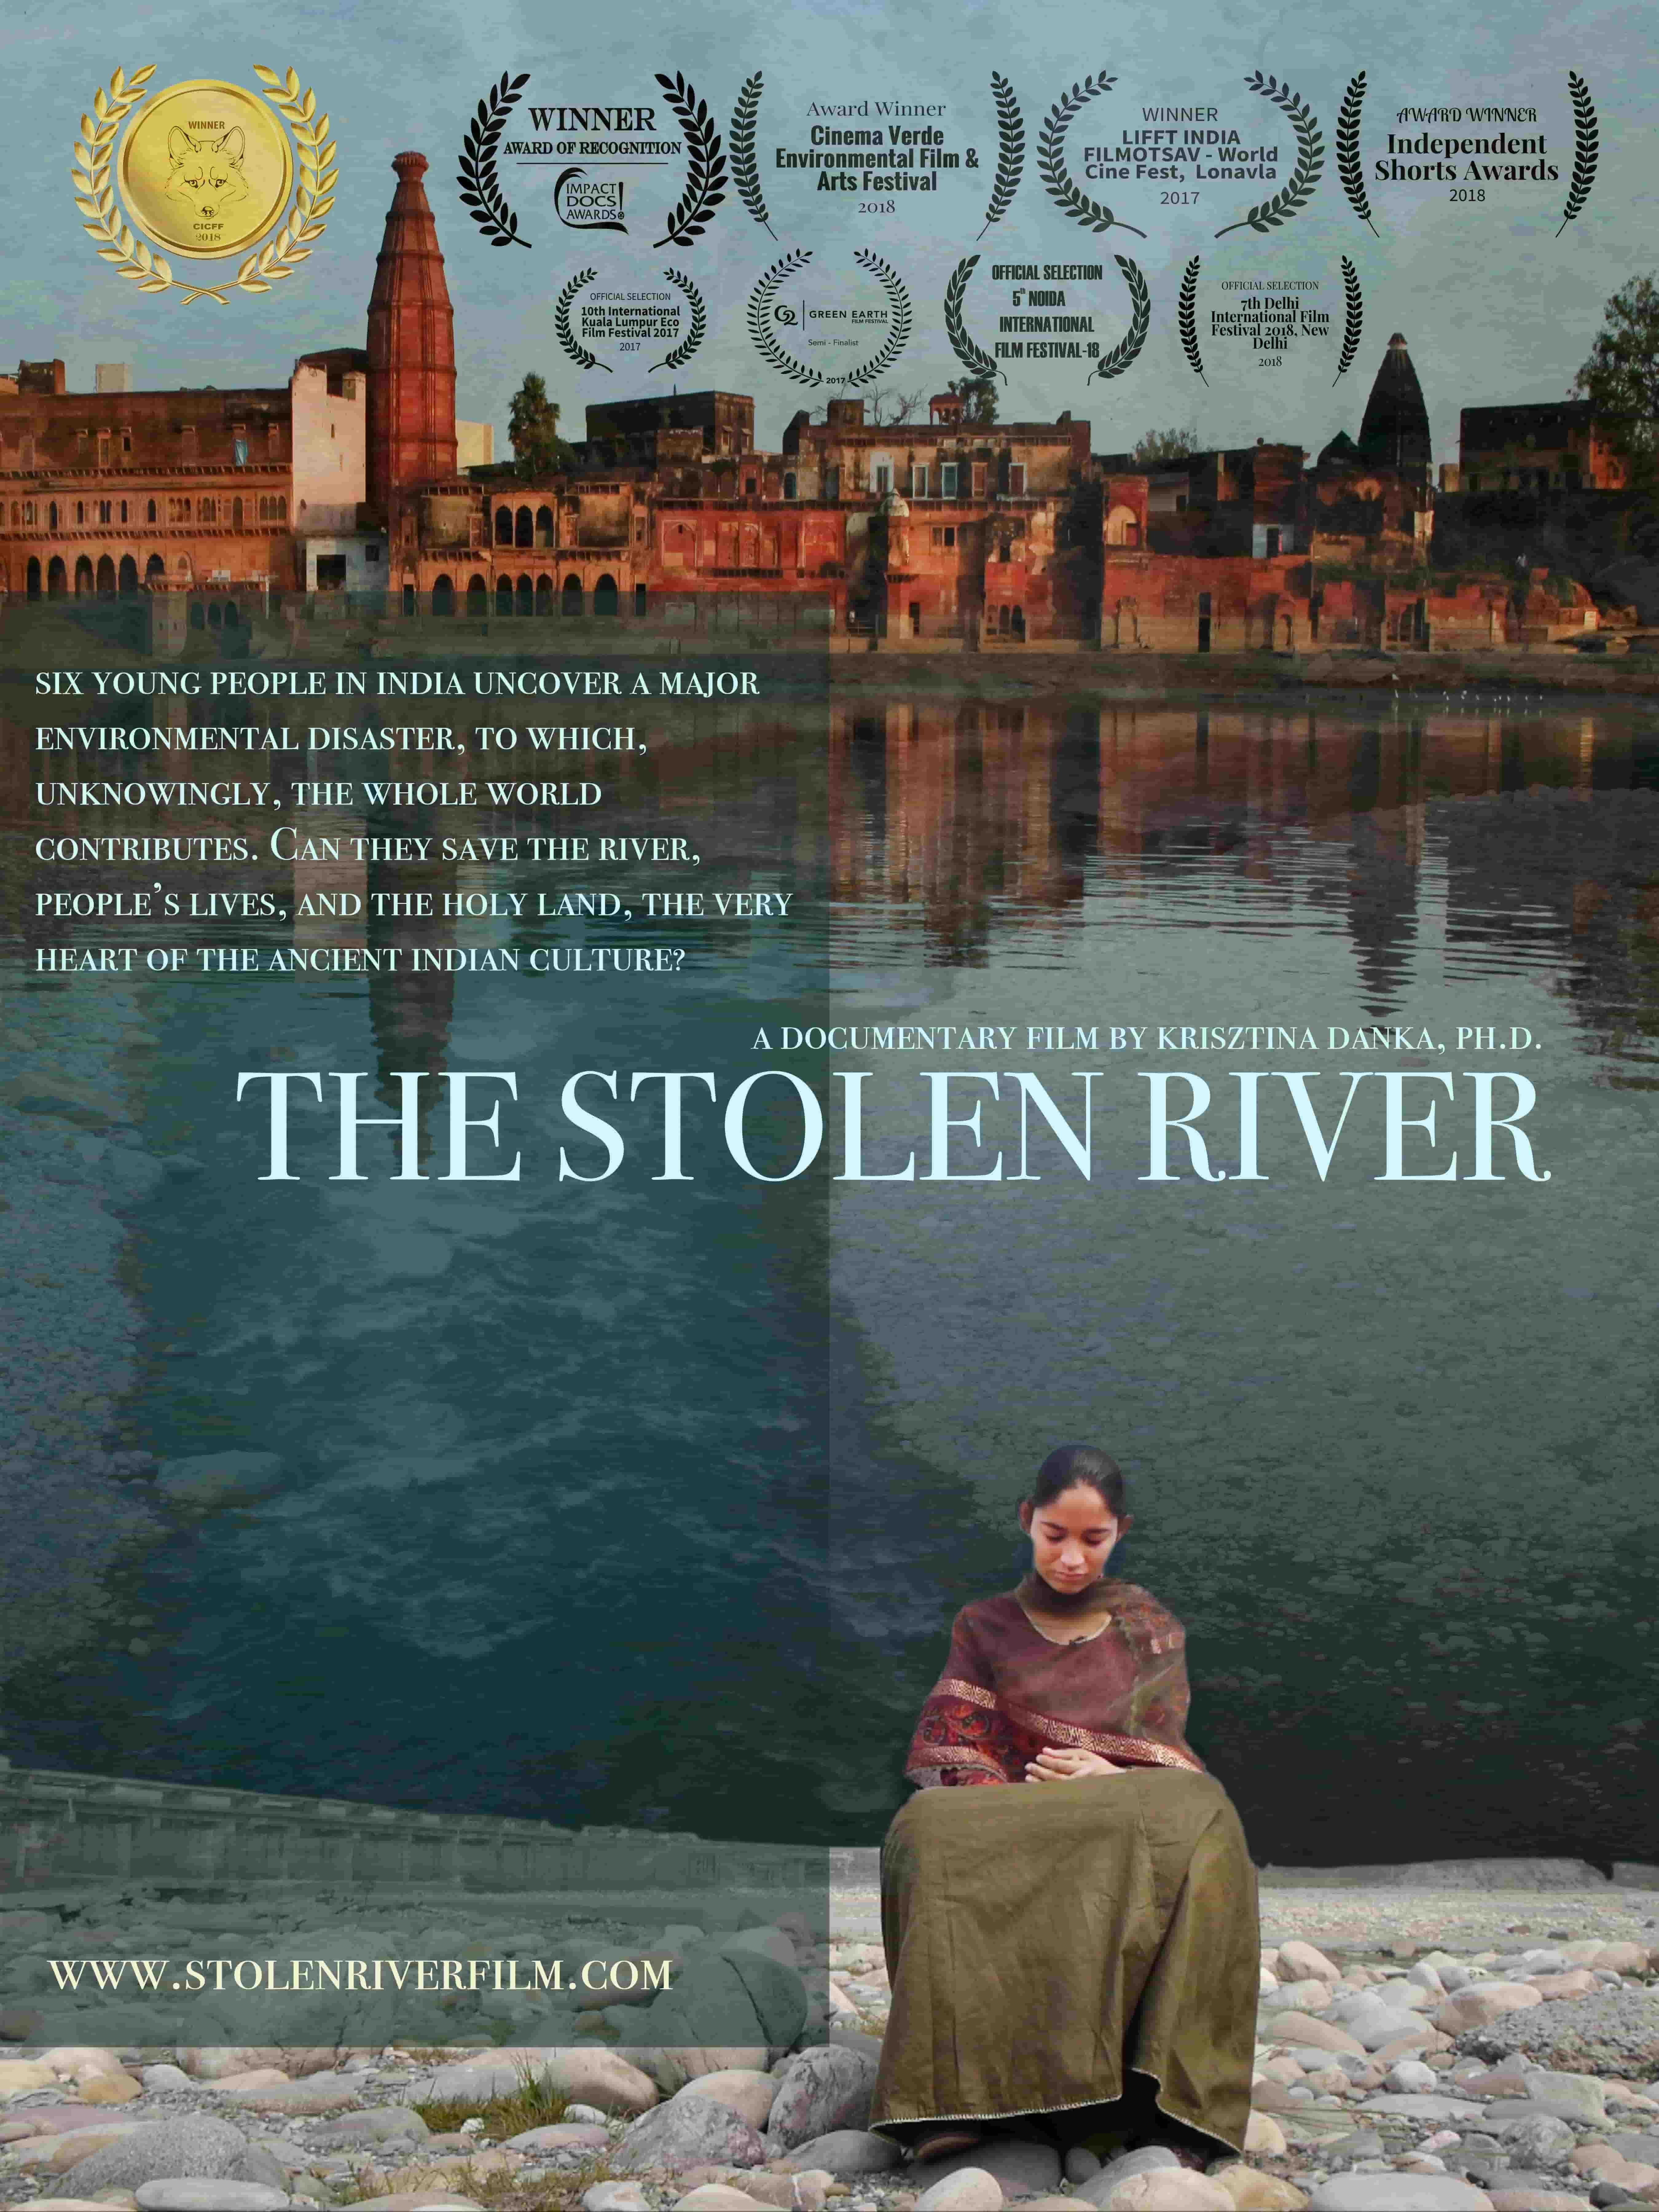 The Stolen River: Film Screening banner image